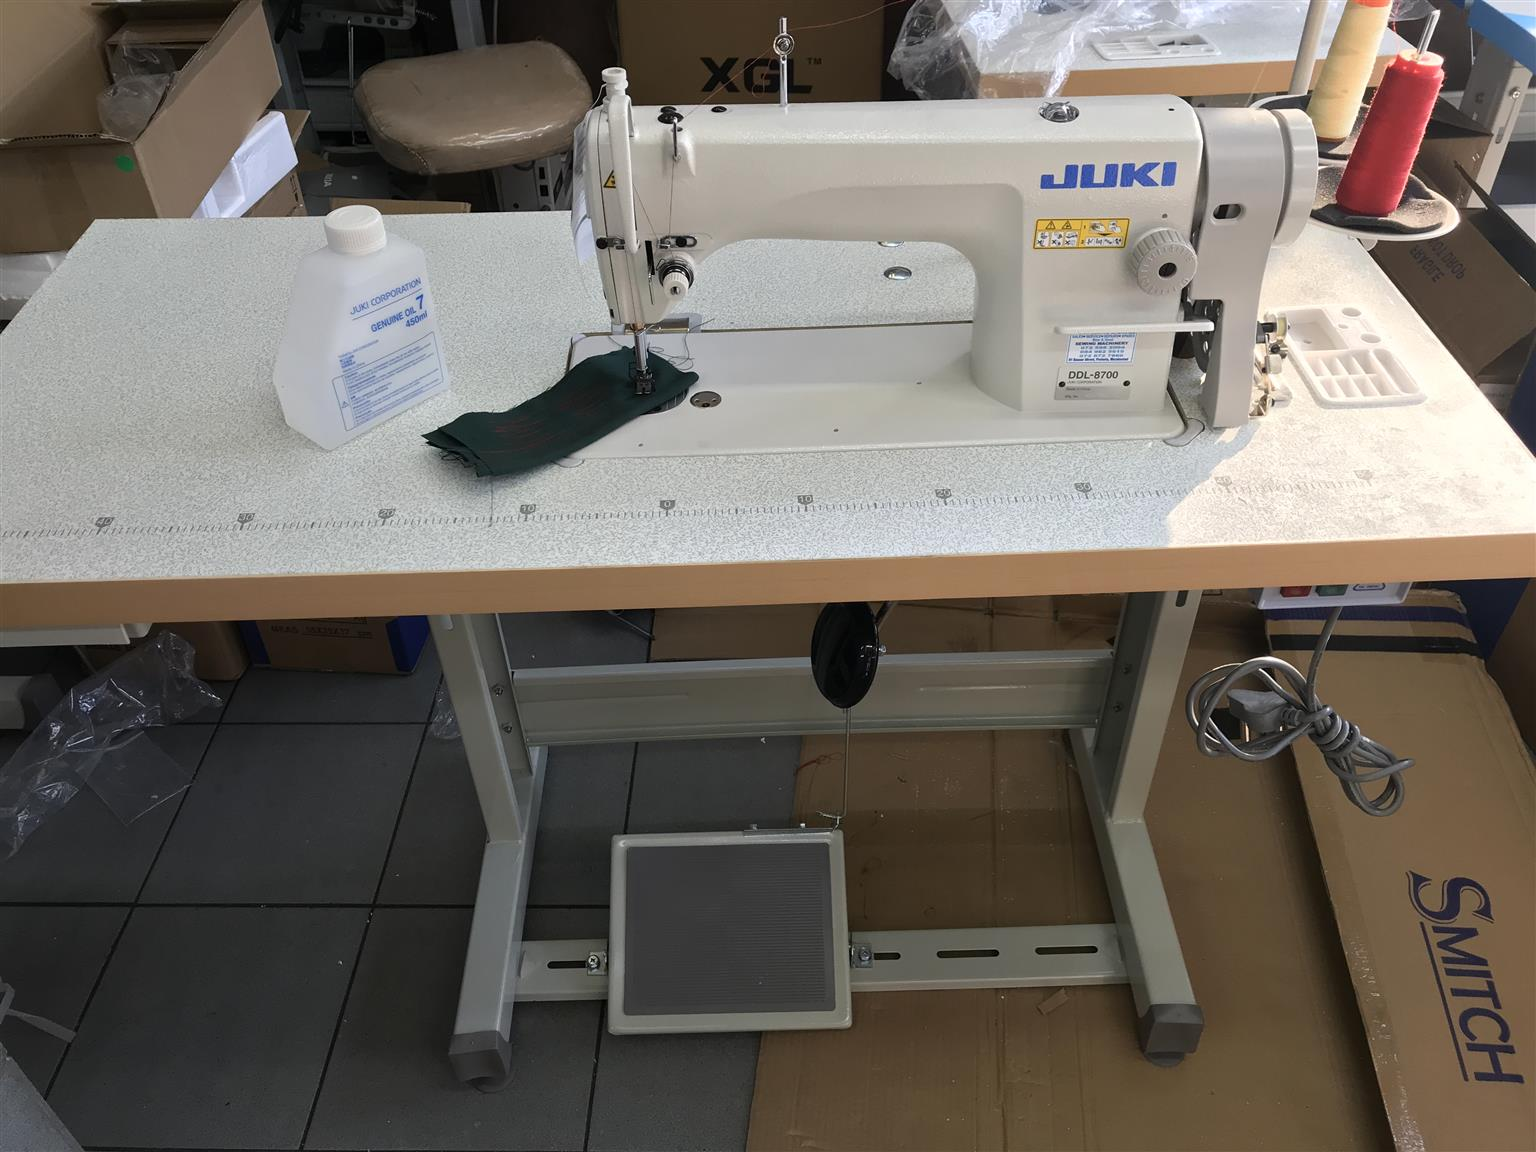 Brand new JUKI industrial sewing machines